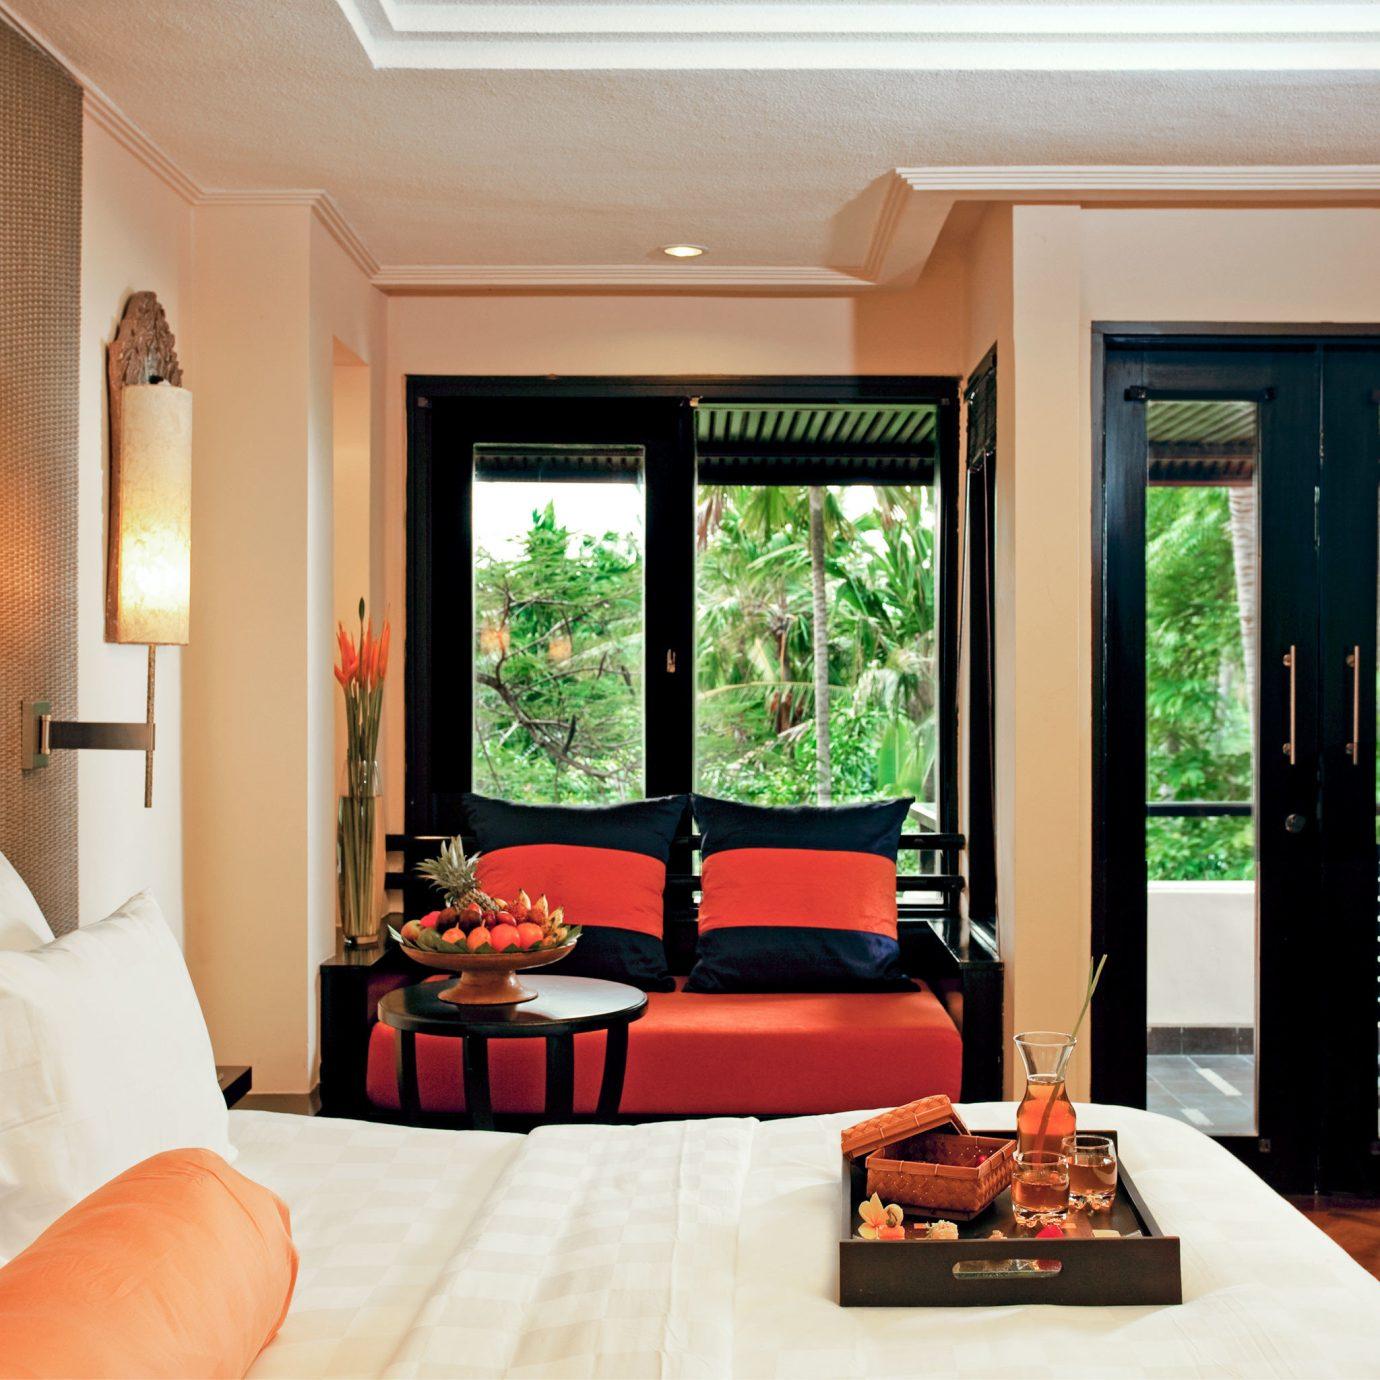 Balcony Bedroom Classic Deck Hotels Patio Resort property home Suite living room condominium cottage Villa mansion Modern